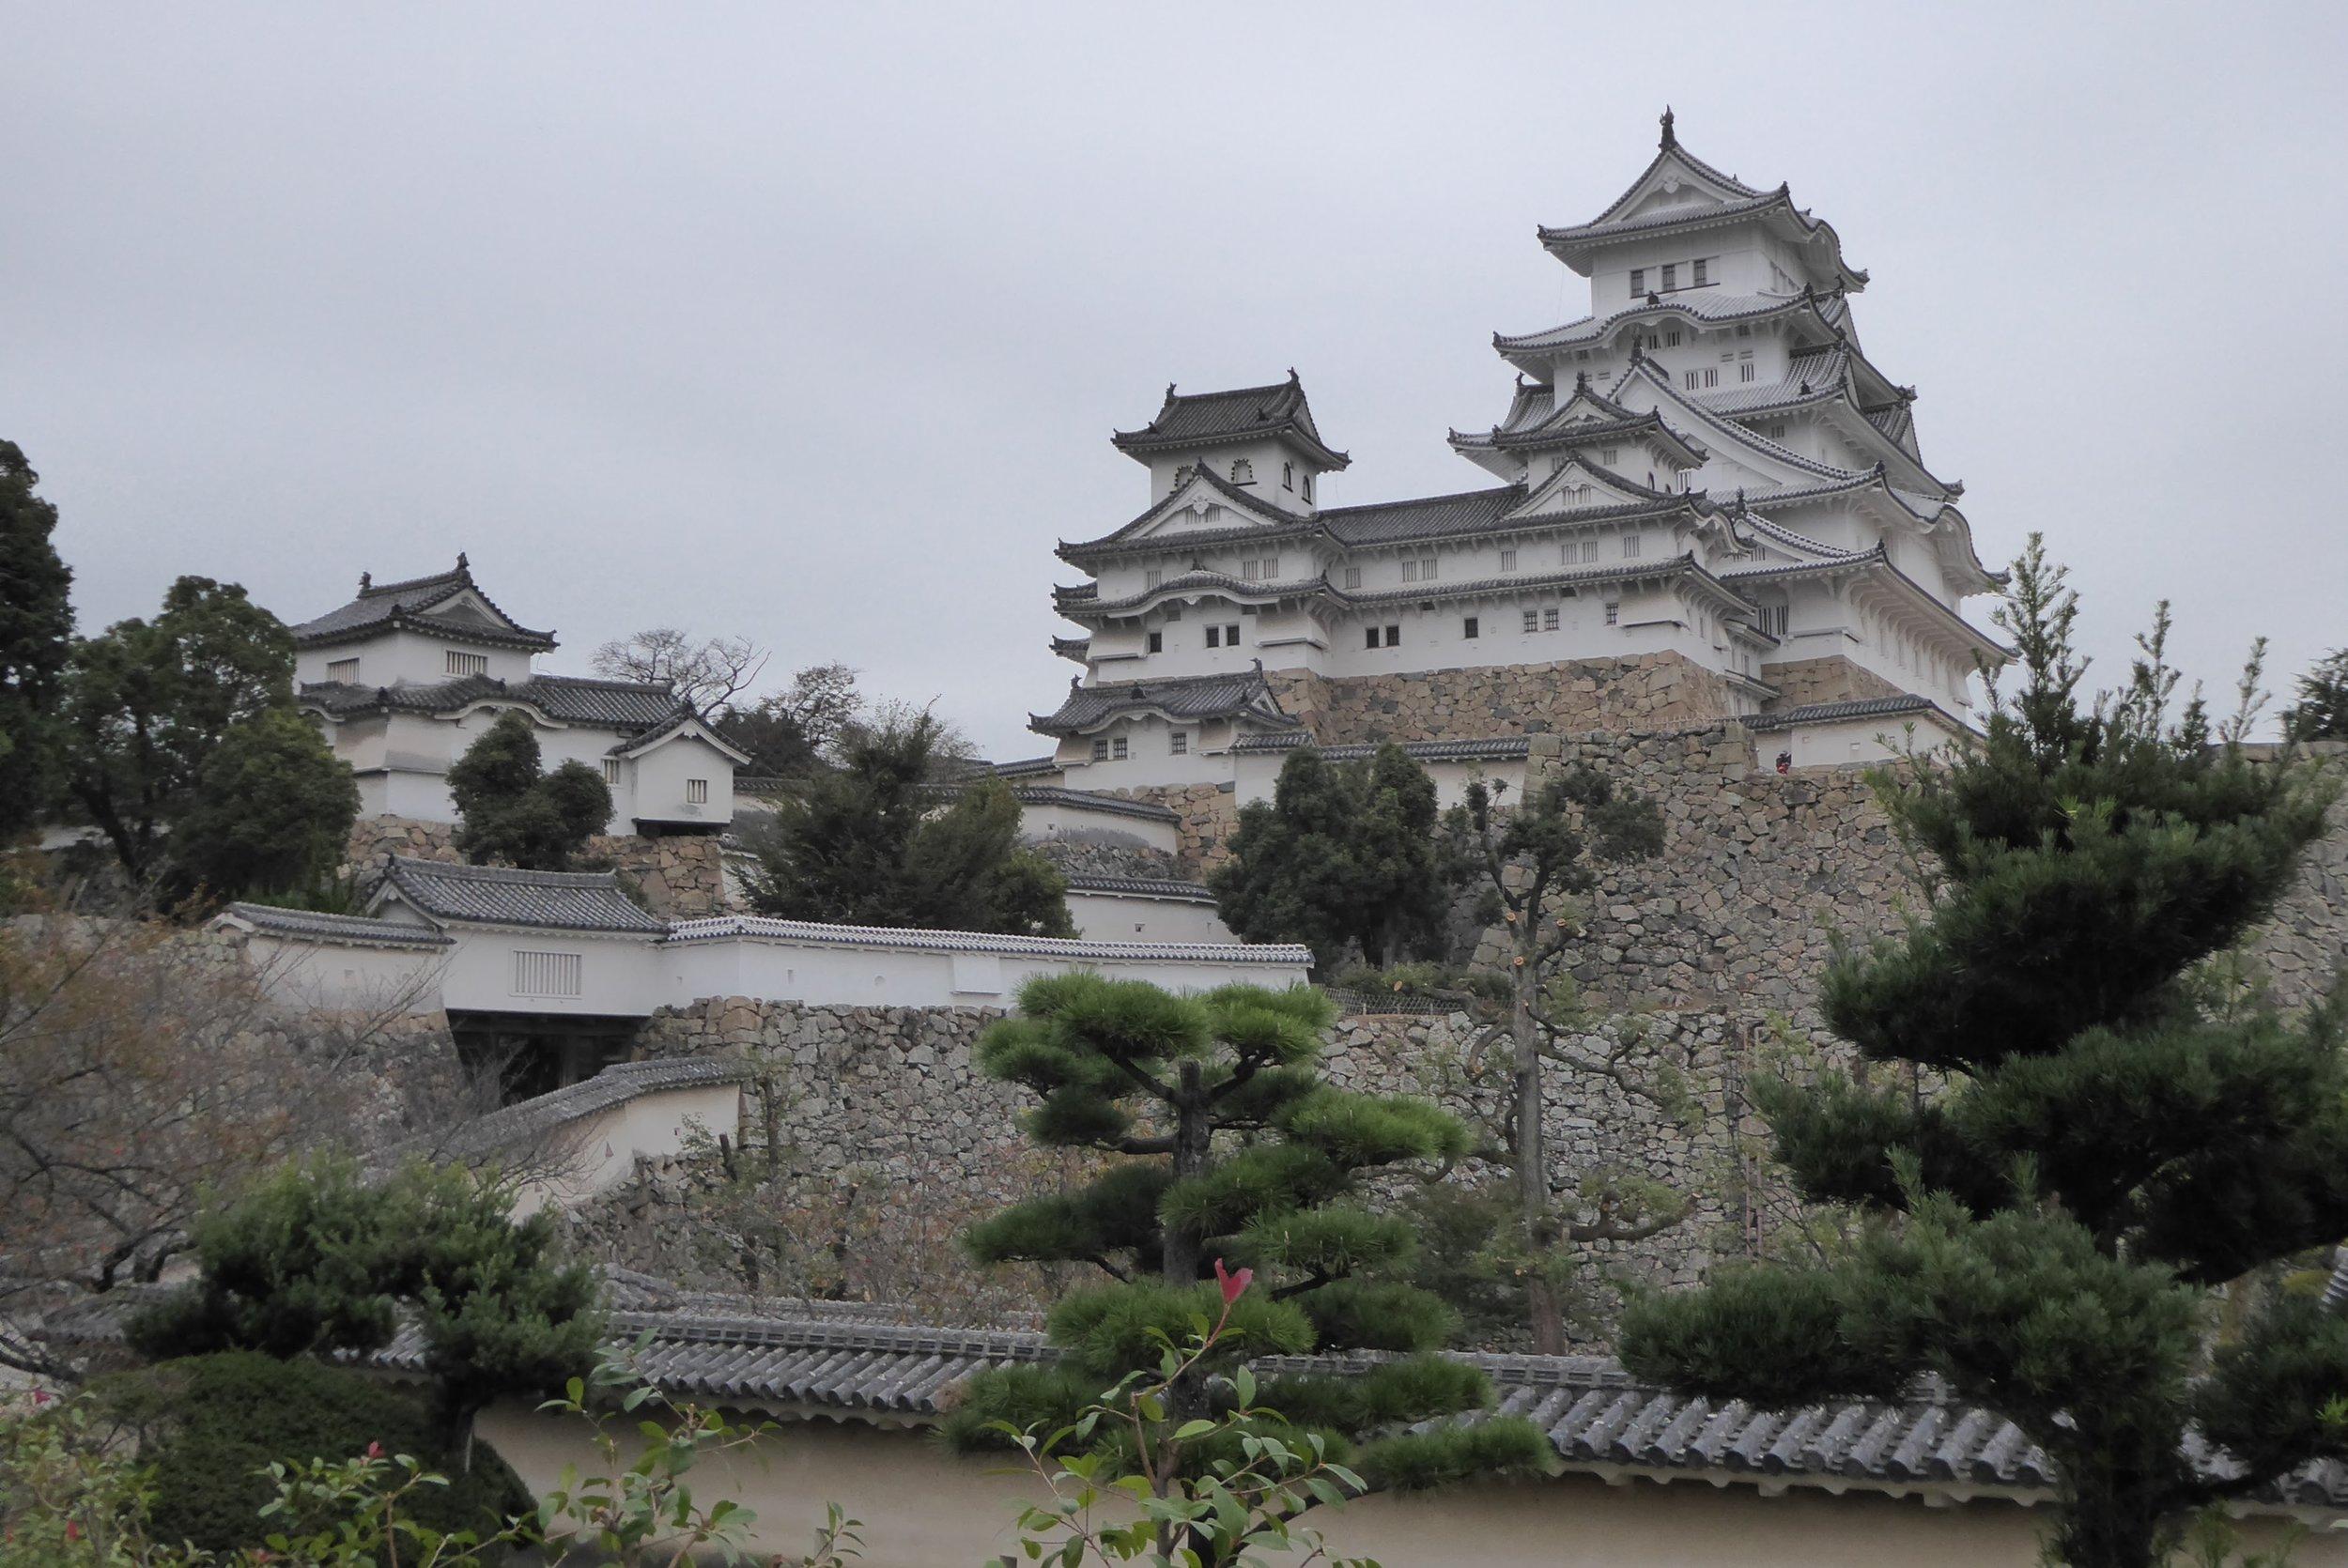 Ruta Japón - Descubre Japón en 9-10 días con TravelHolics